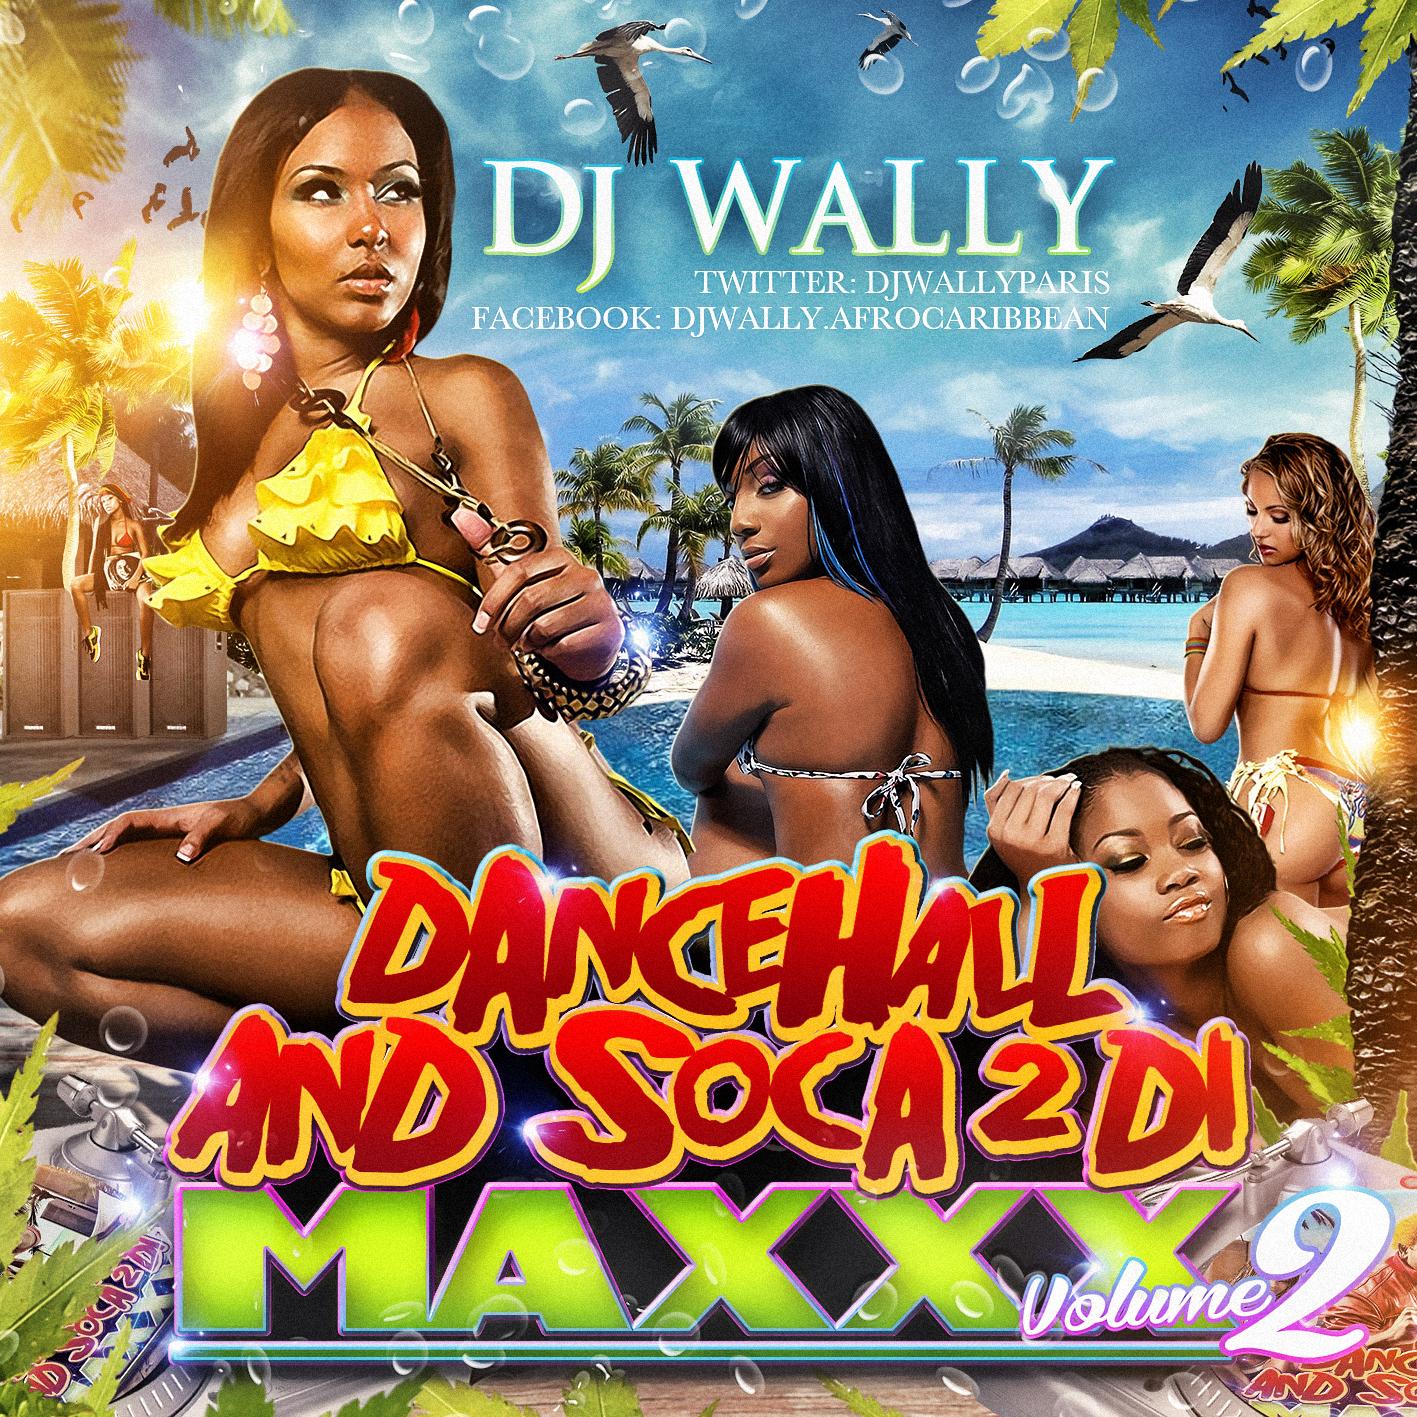 DJ WALLY – DANCEHALL AND SOCA TO DI MAXXX – VOLUME 3